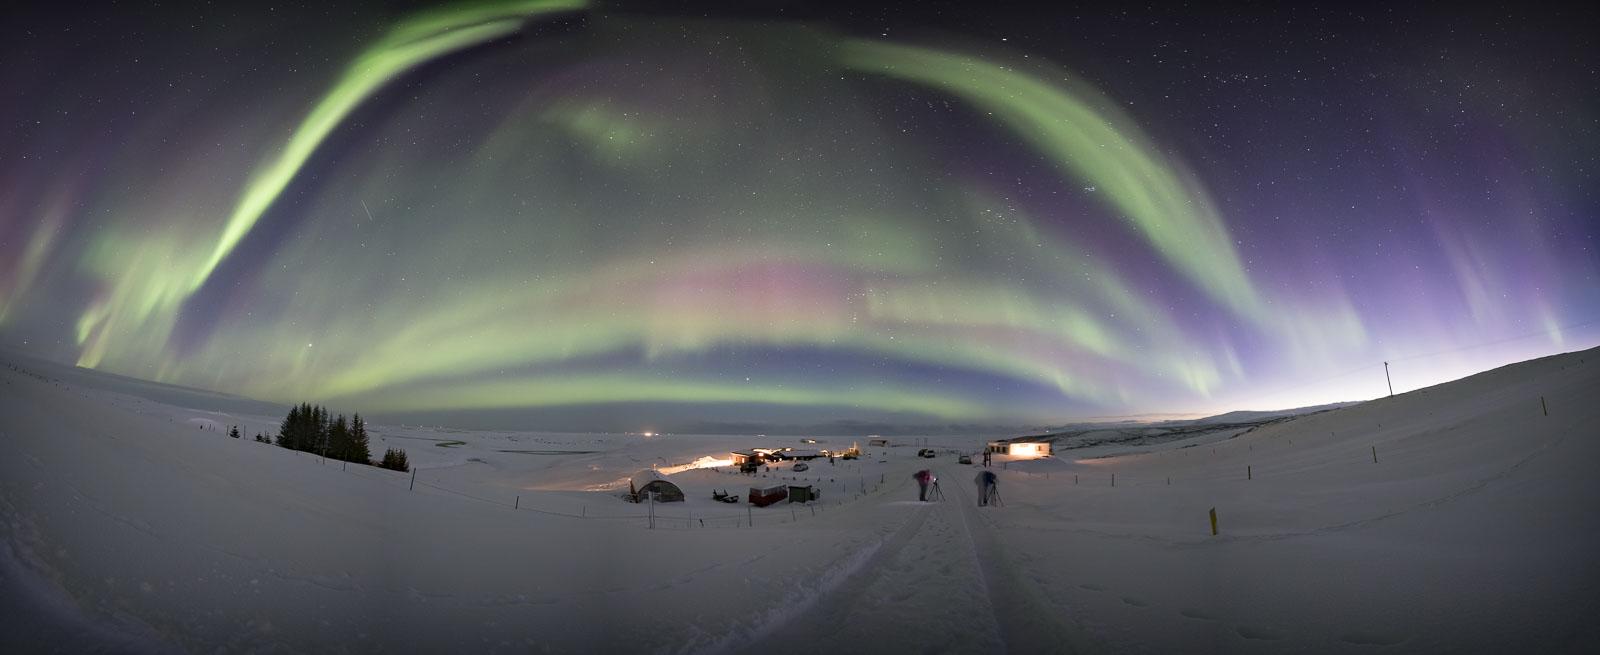 Aurora panorama of G3 major storm